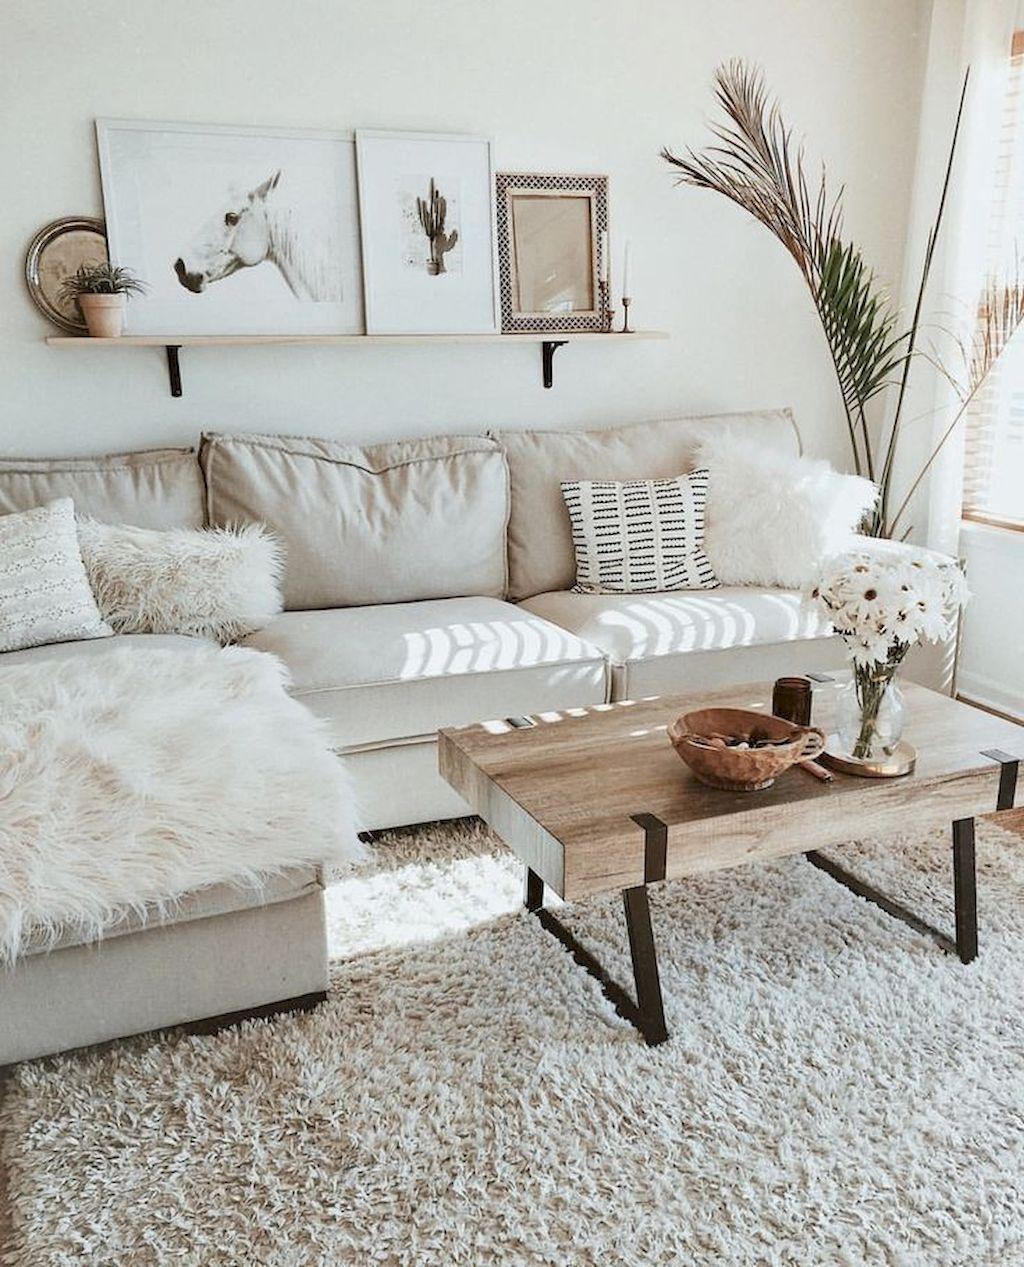 50+ Minimalist Furniture Ideas for 2019 #apartmentdecor